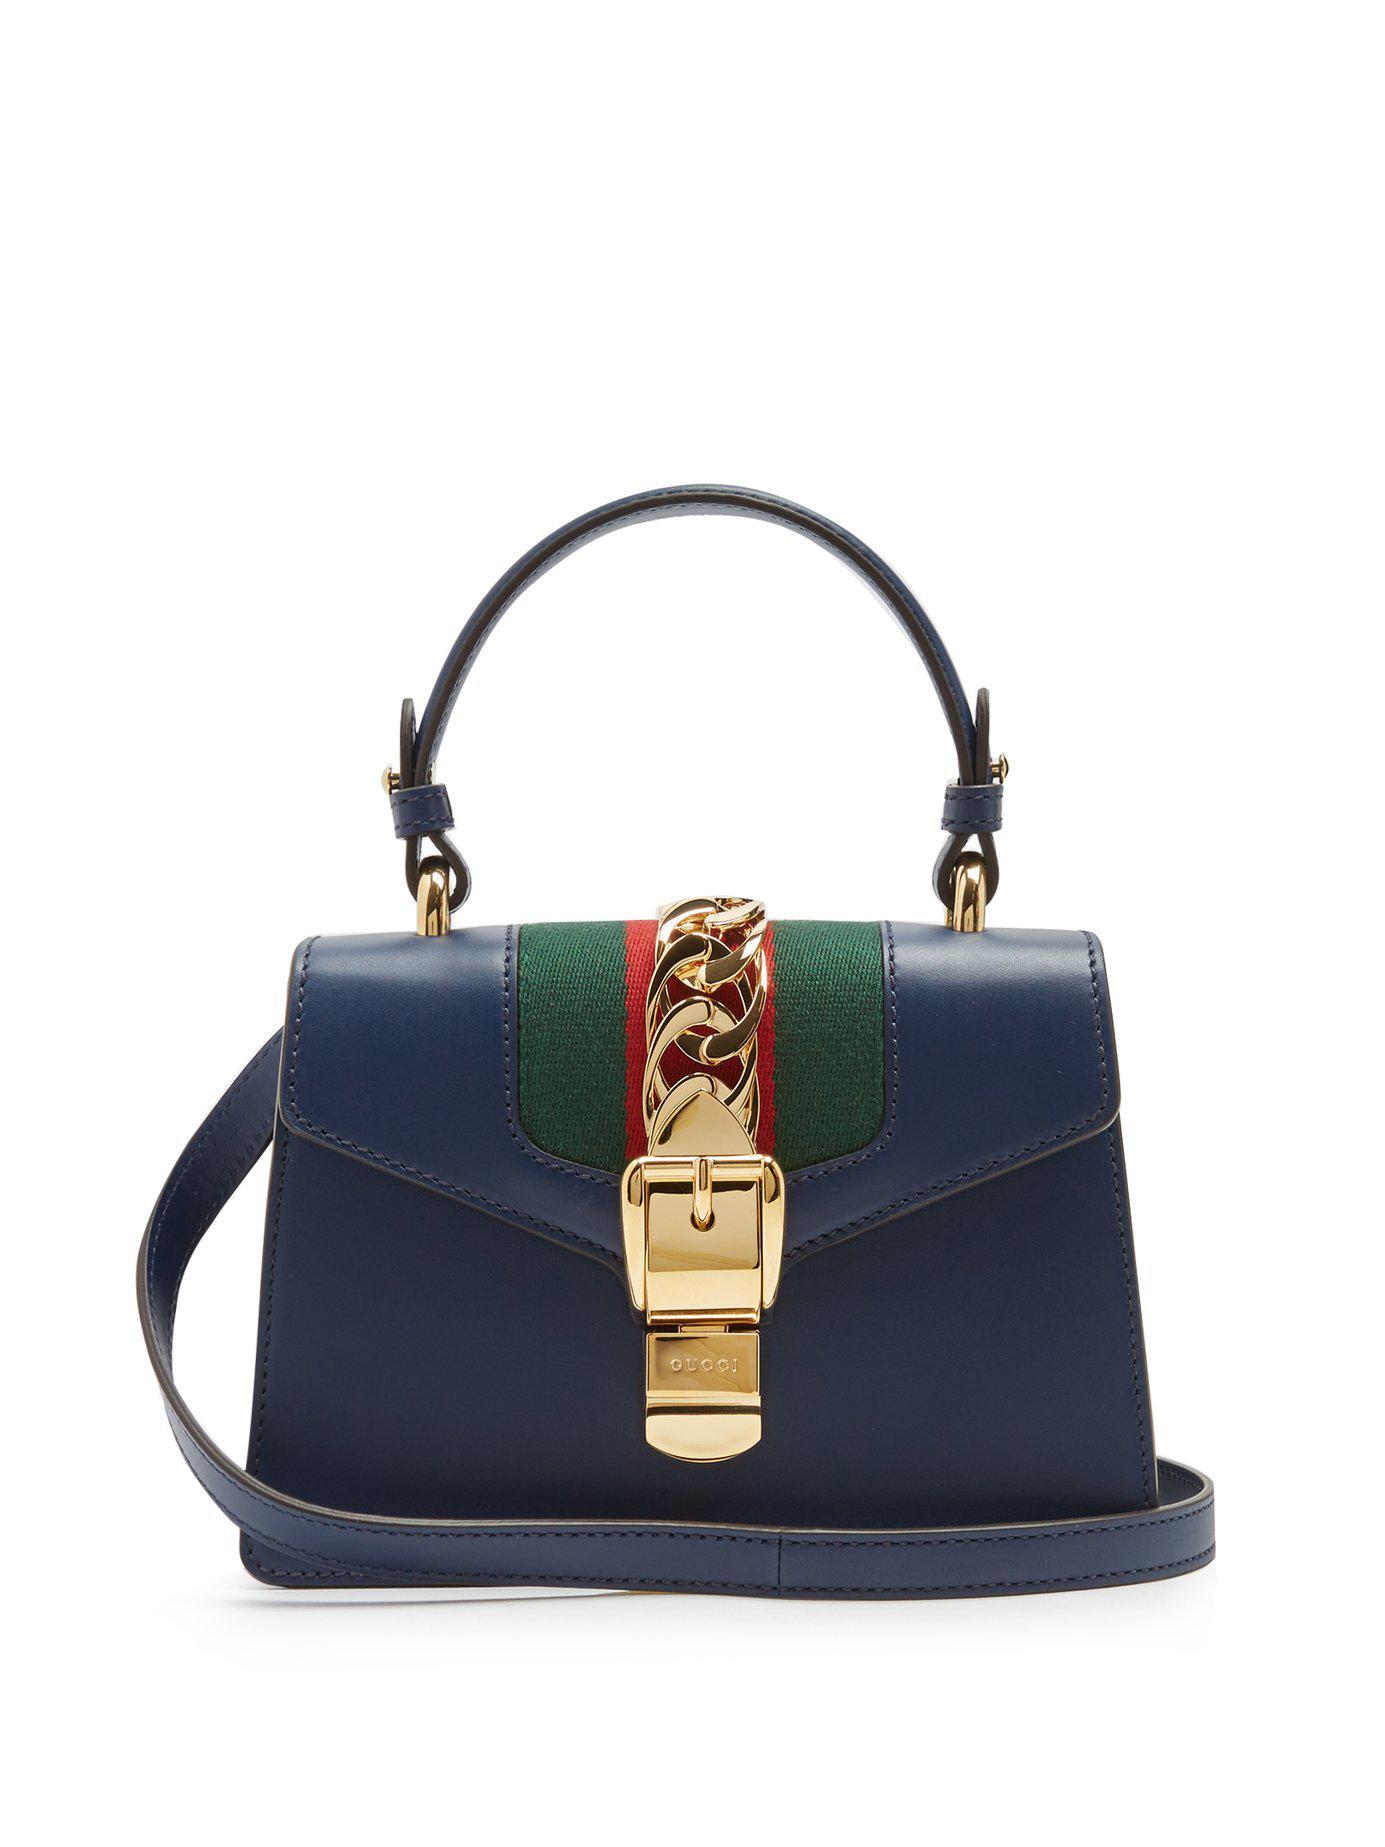 2d7a1e8df22 Lyst - Gucci Sylvie Mini Leather Shoulder Bag in Blue